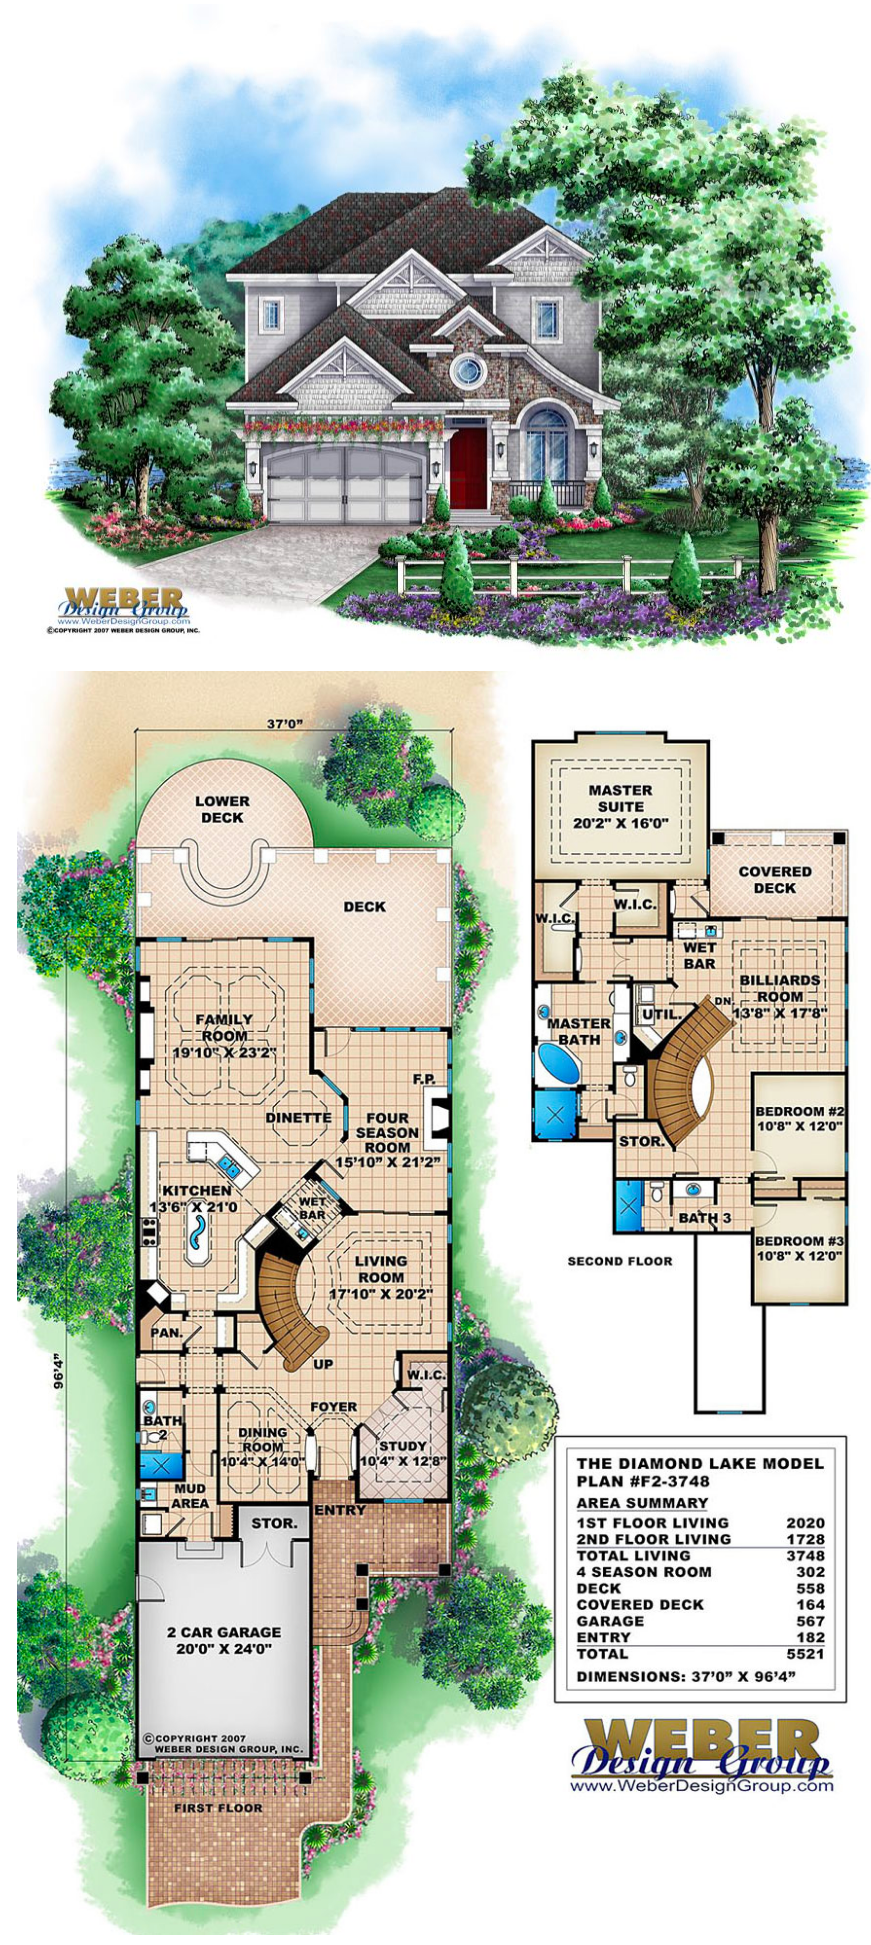 Craftsman House Plan Narrow Lot California Bungalow Style Floor Plan Beach House Plans Unique House Plans Lake House Plans